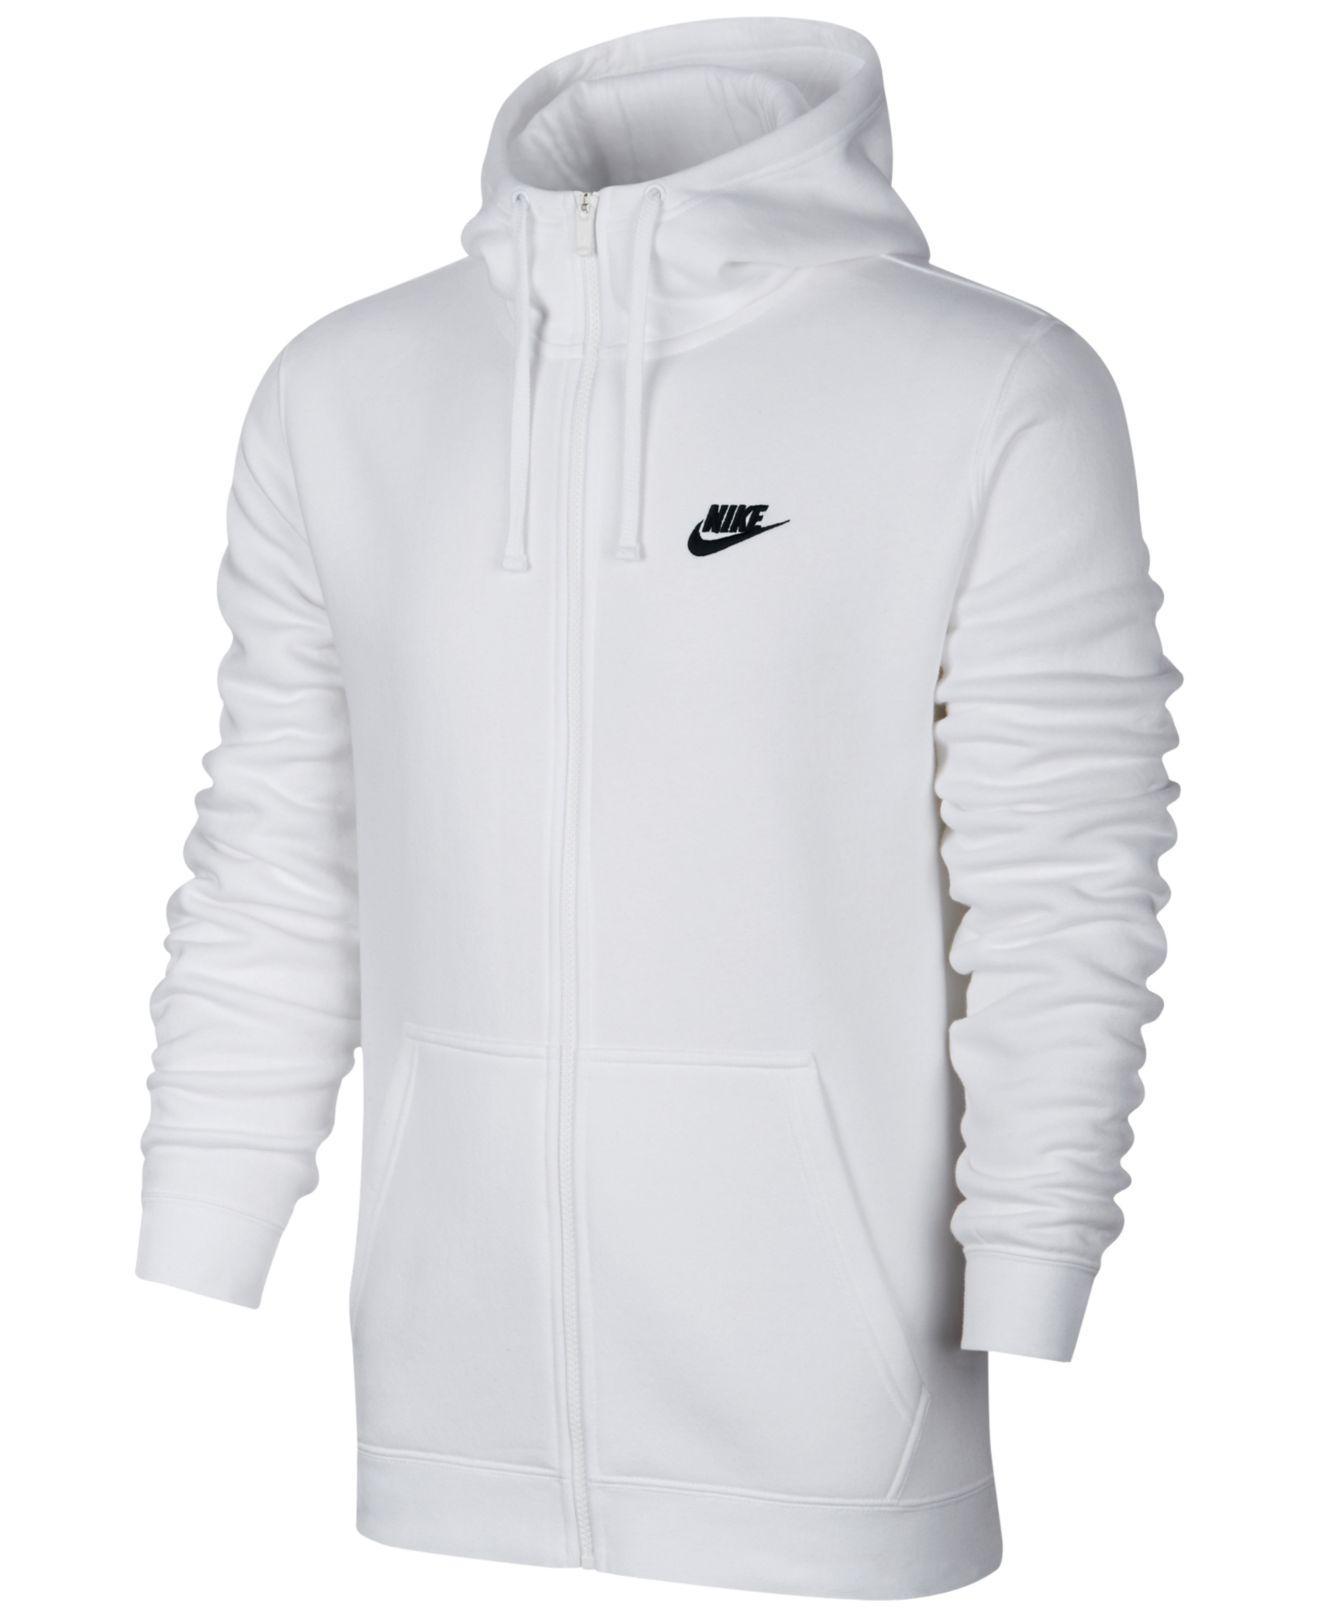 942b8b32b16 Nike - White Men s Sportswear Zip Hoodie for Men - Lyst. View fullscreen